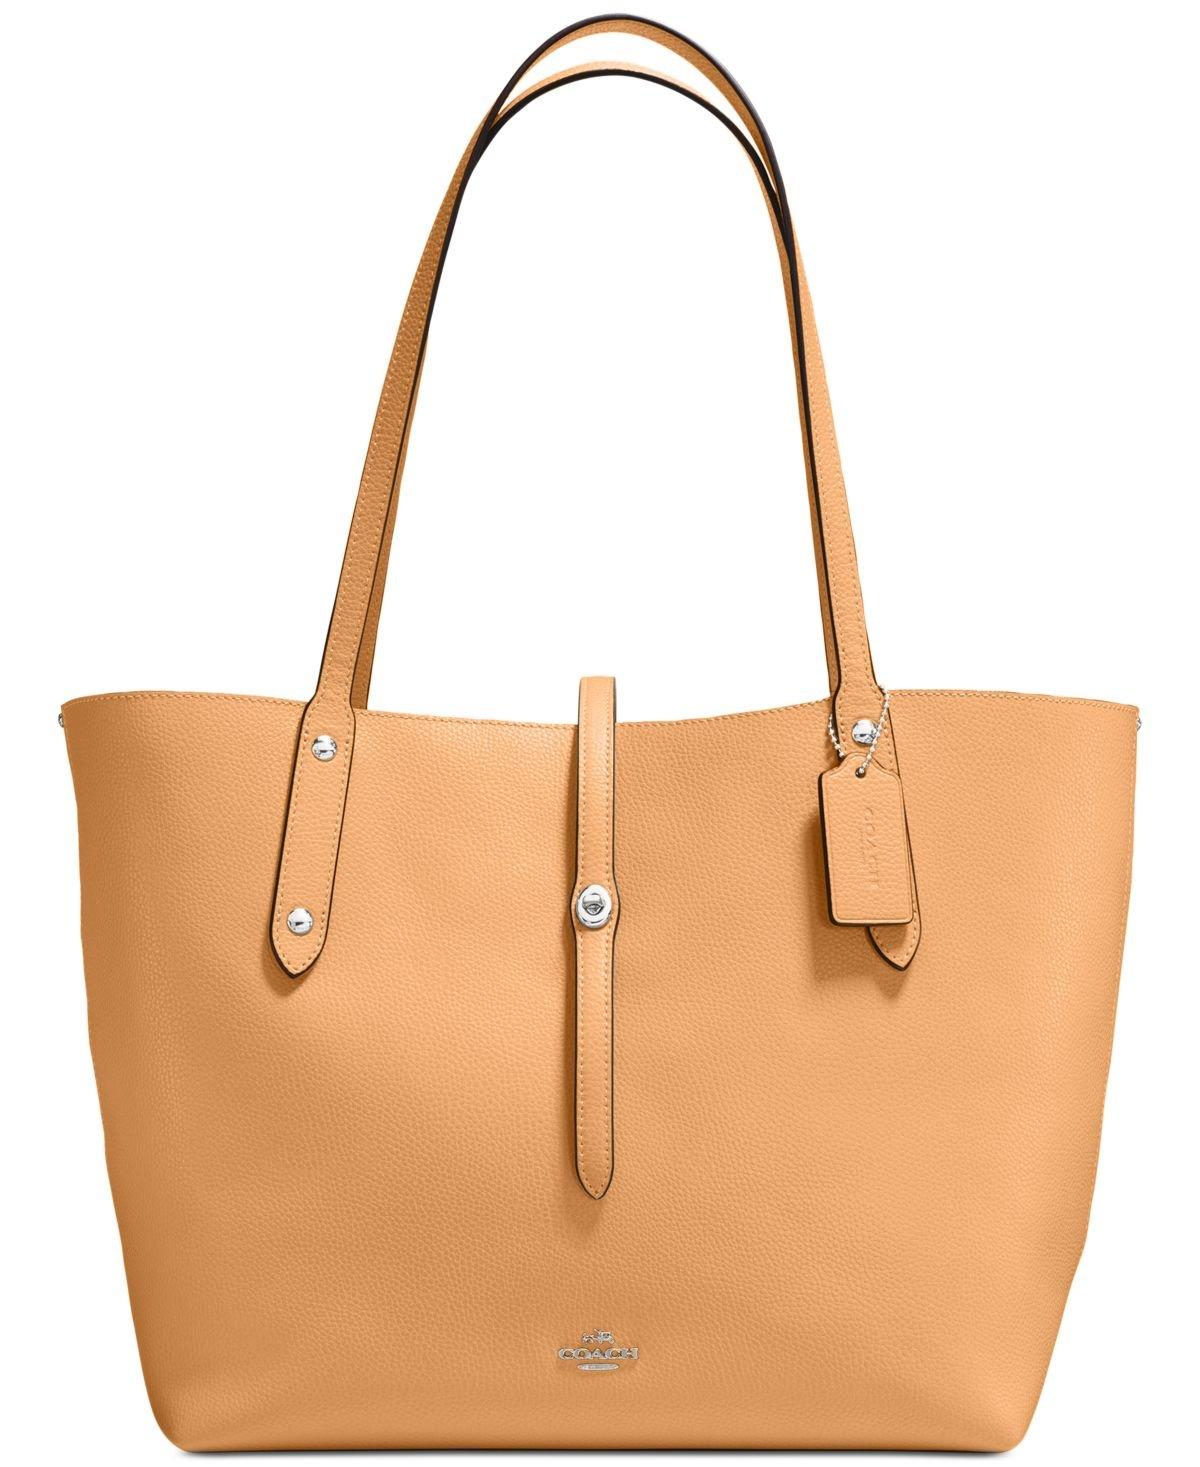 COACH Women's Polished Pebbled Leather Market Tote Sv/Light Saddle Cloud Handbag